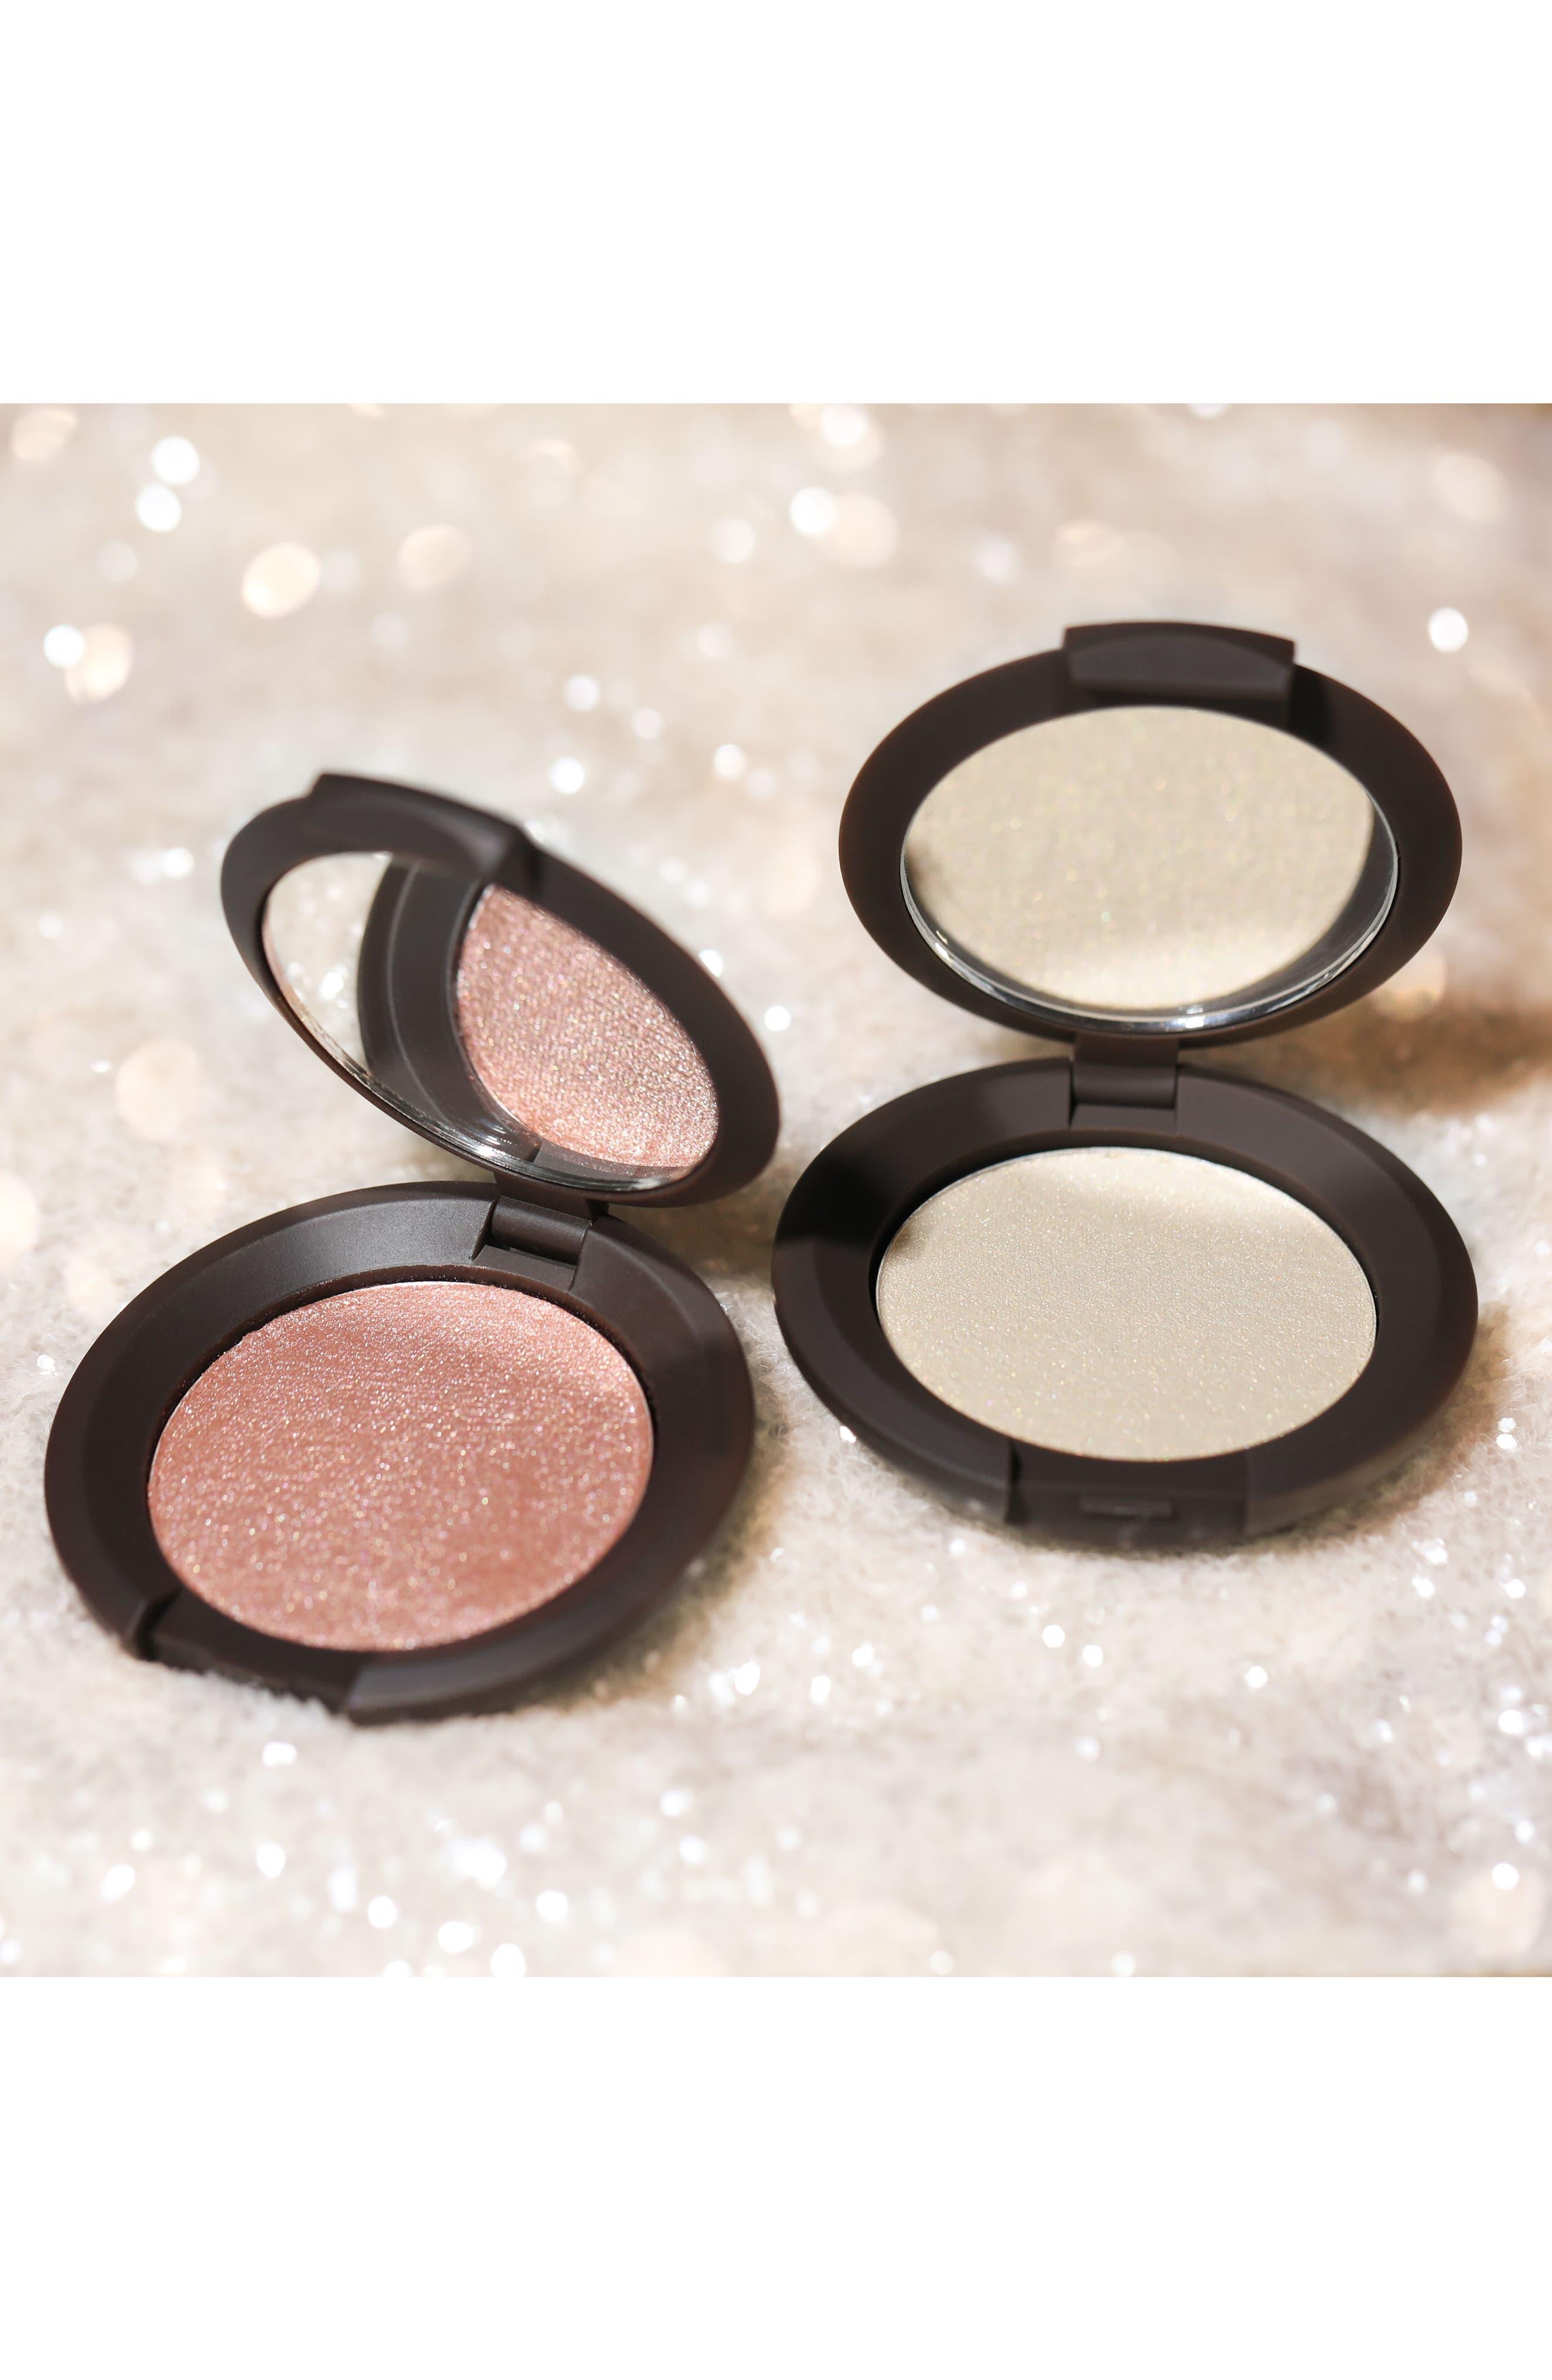 BECCA Shimmering Skin Perfector Pressed Highlighter,                             Alternate thumbnail 8, color,